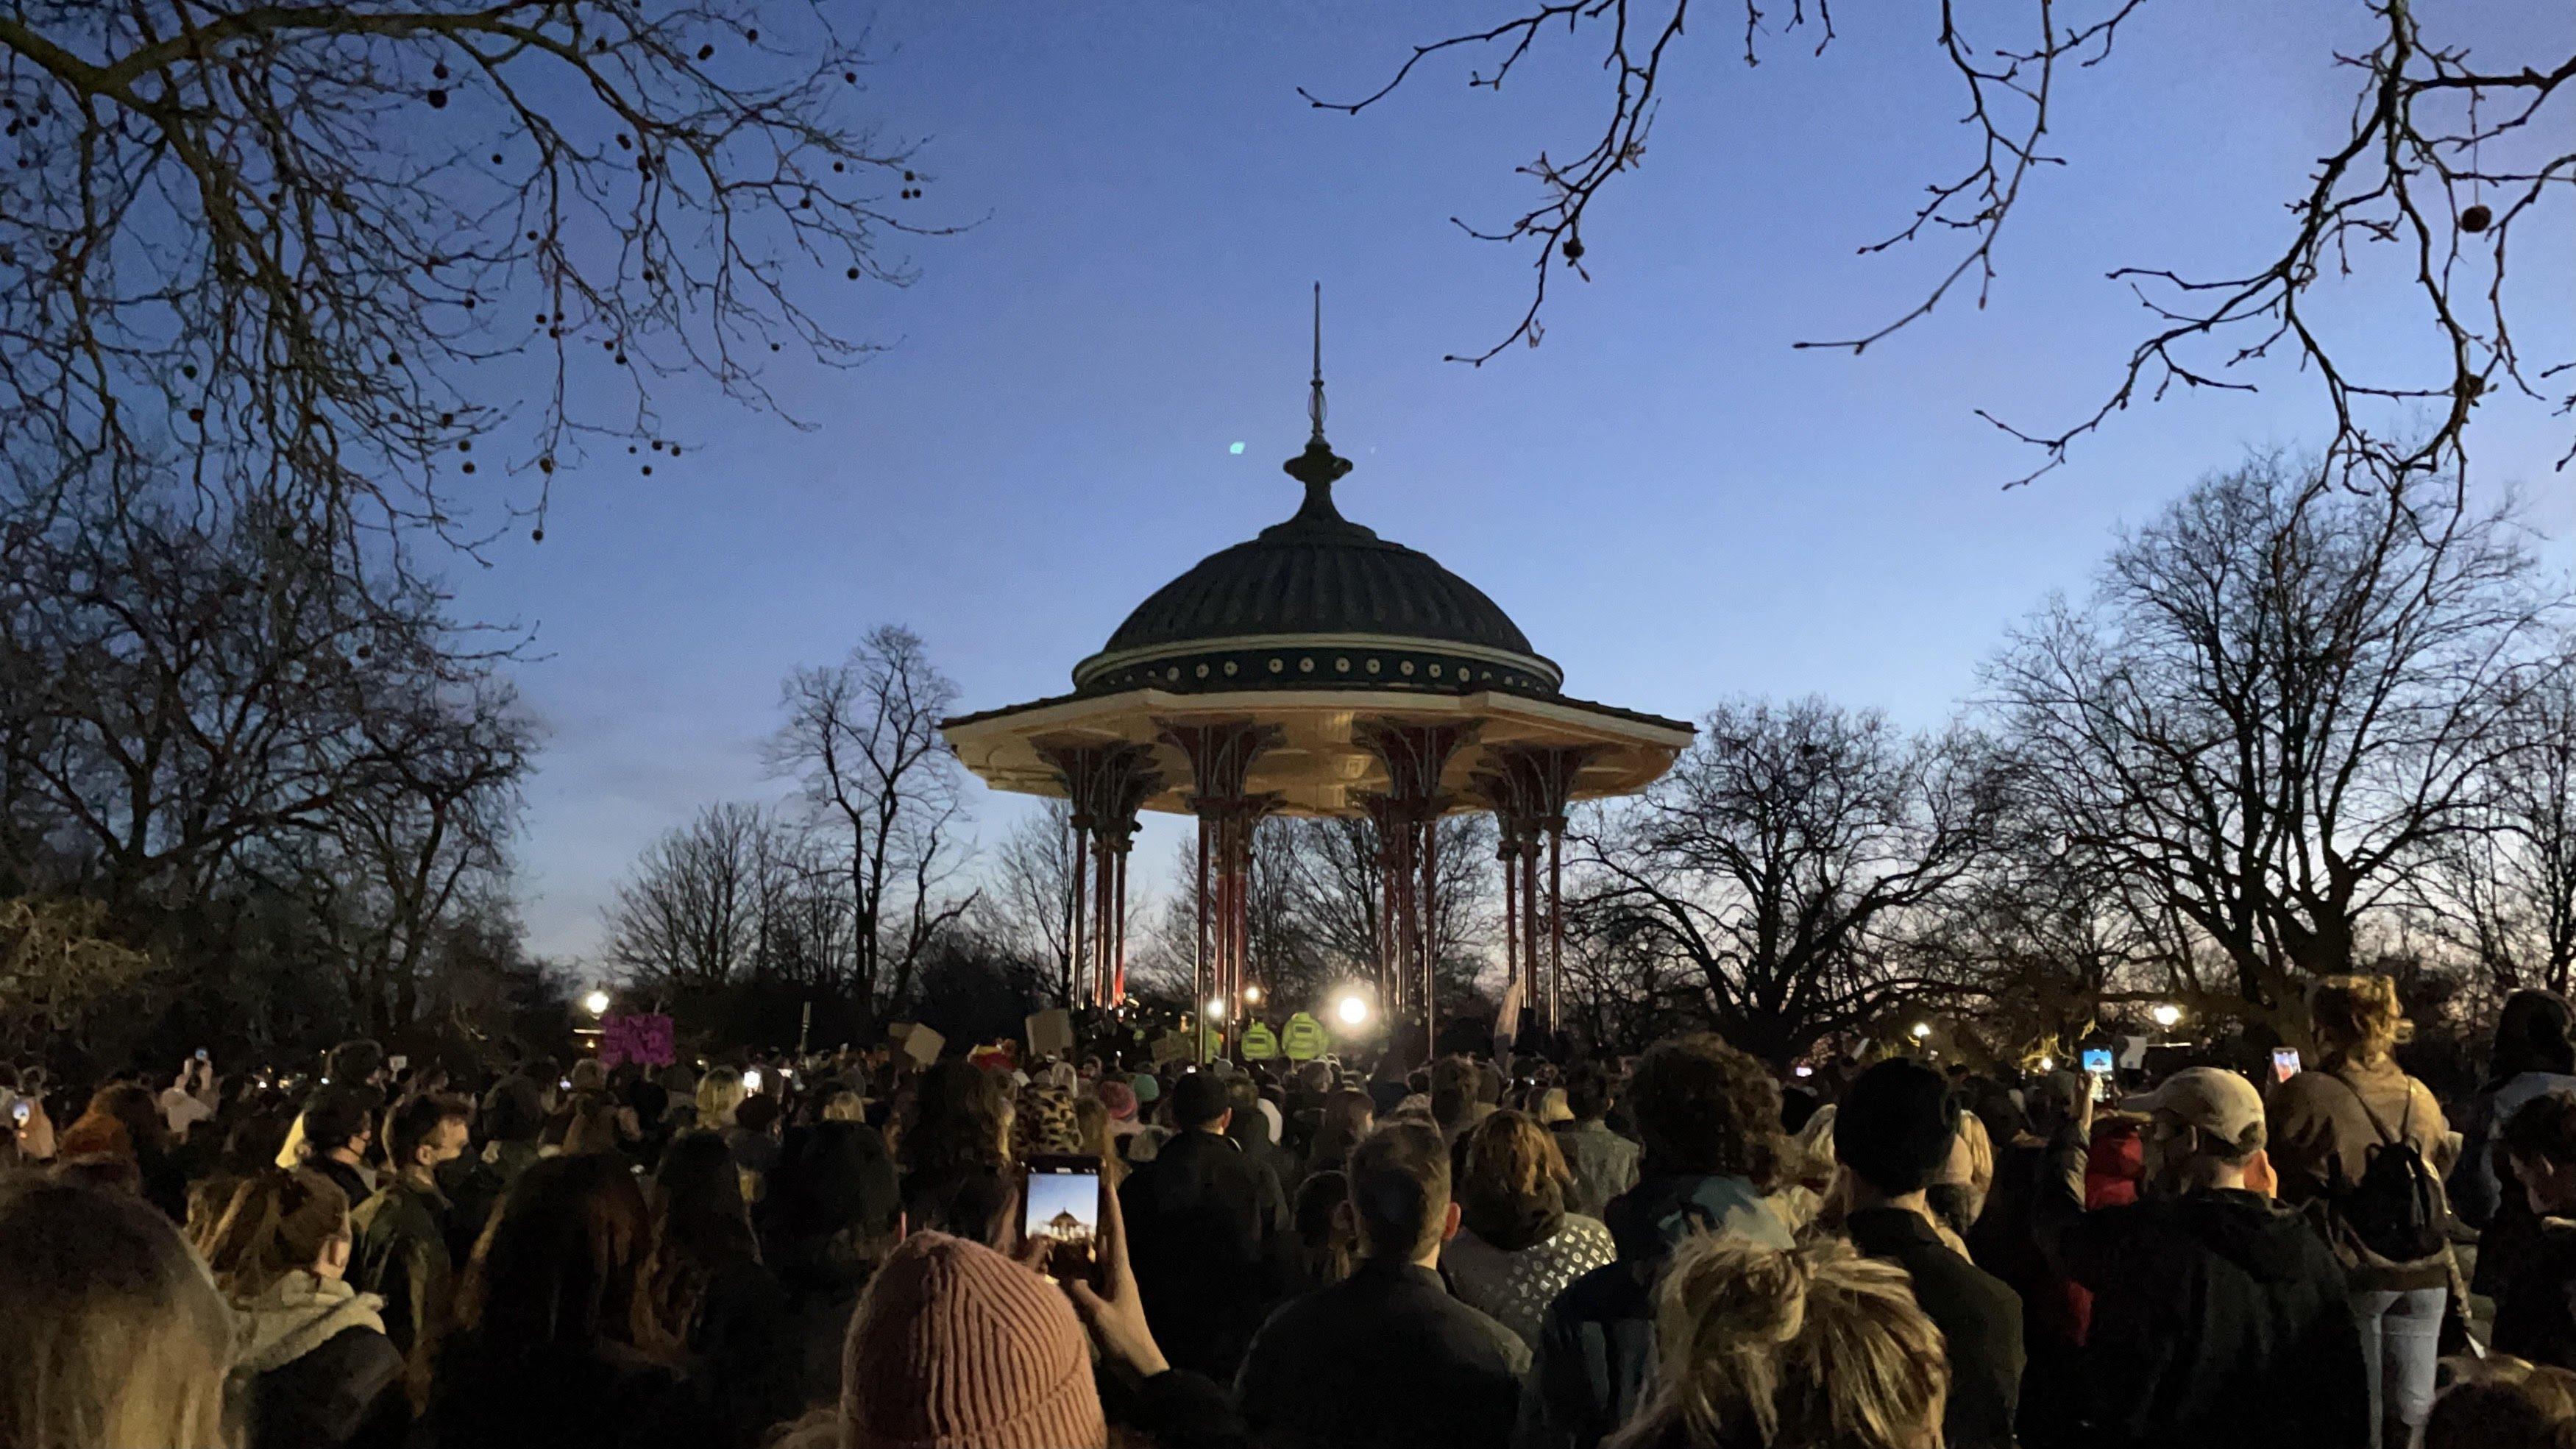 sarah-everard-vigil-clapham-common-gender-violence-uk-IMOW